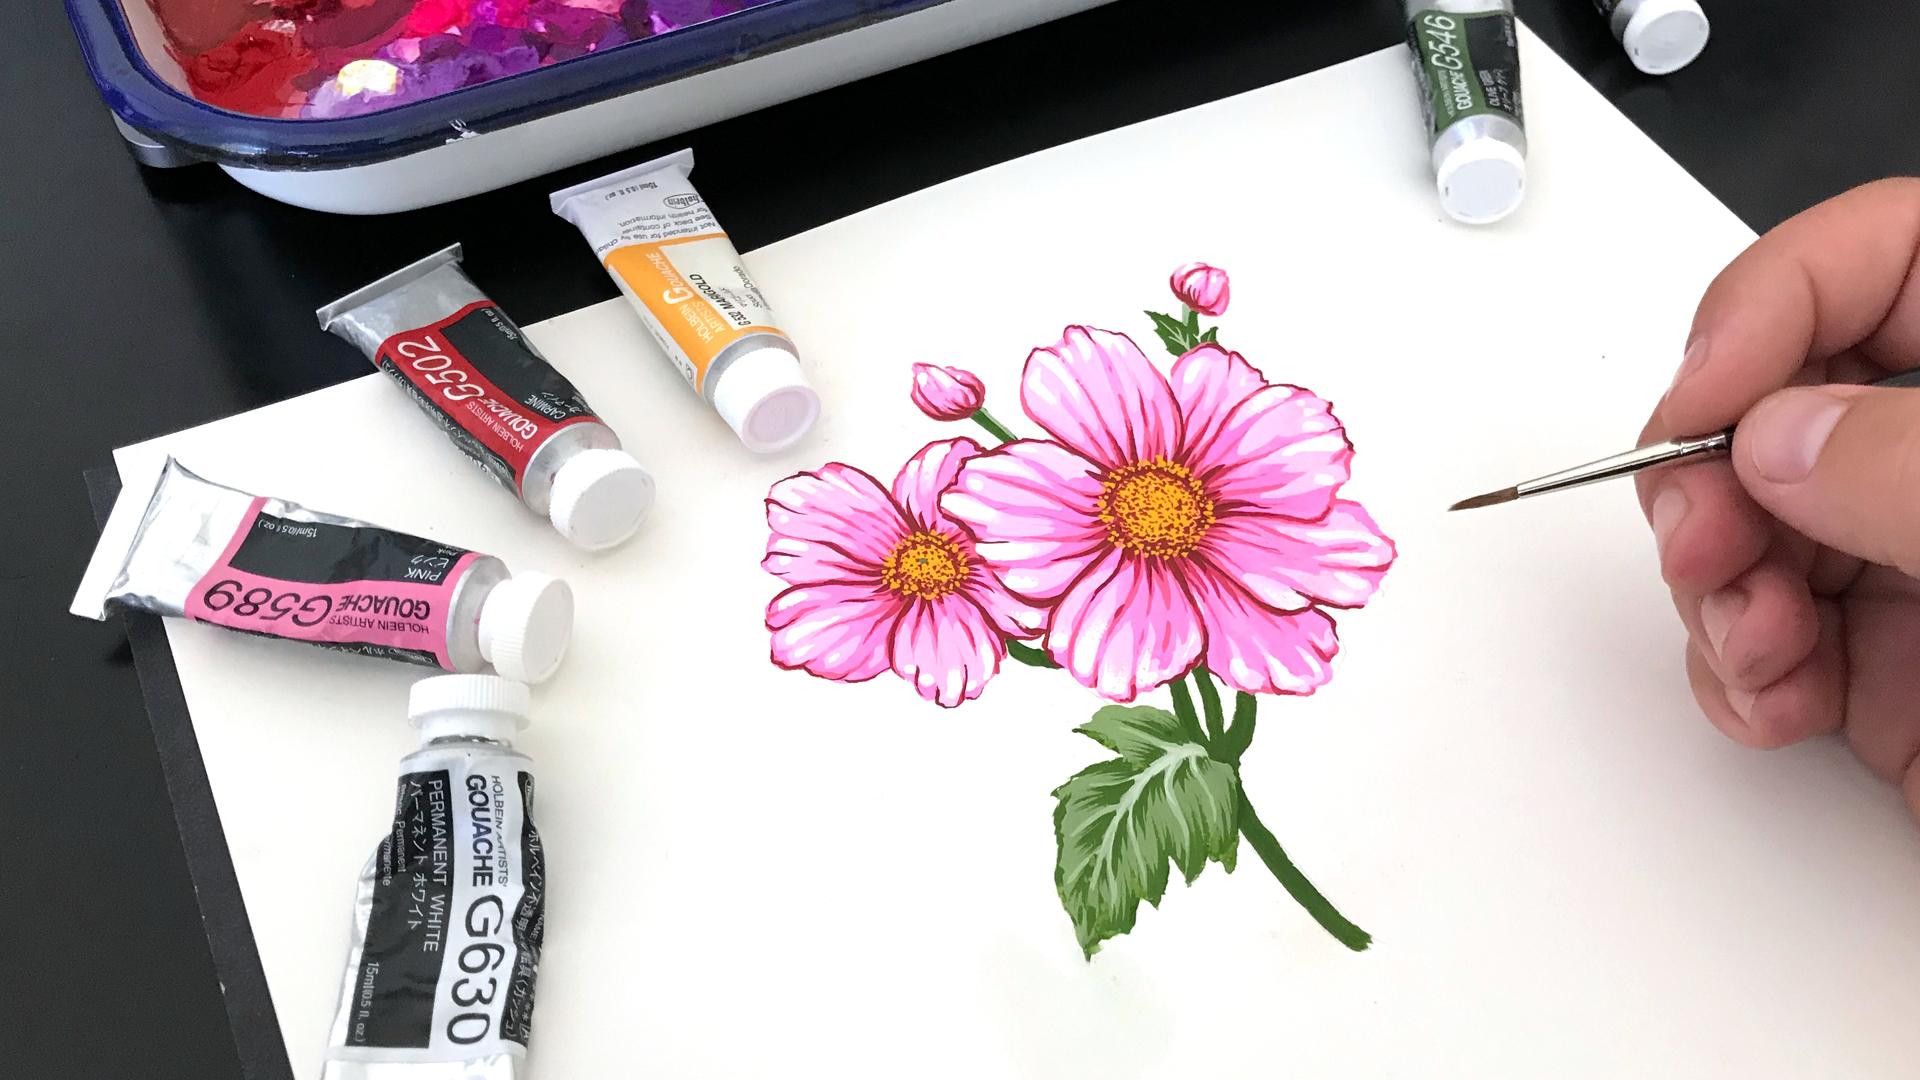 18-09-28-Japanese-Anemone-Flower-Gouache-Painting-thumb.jpg